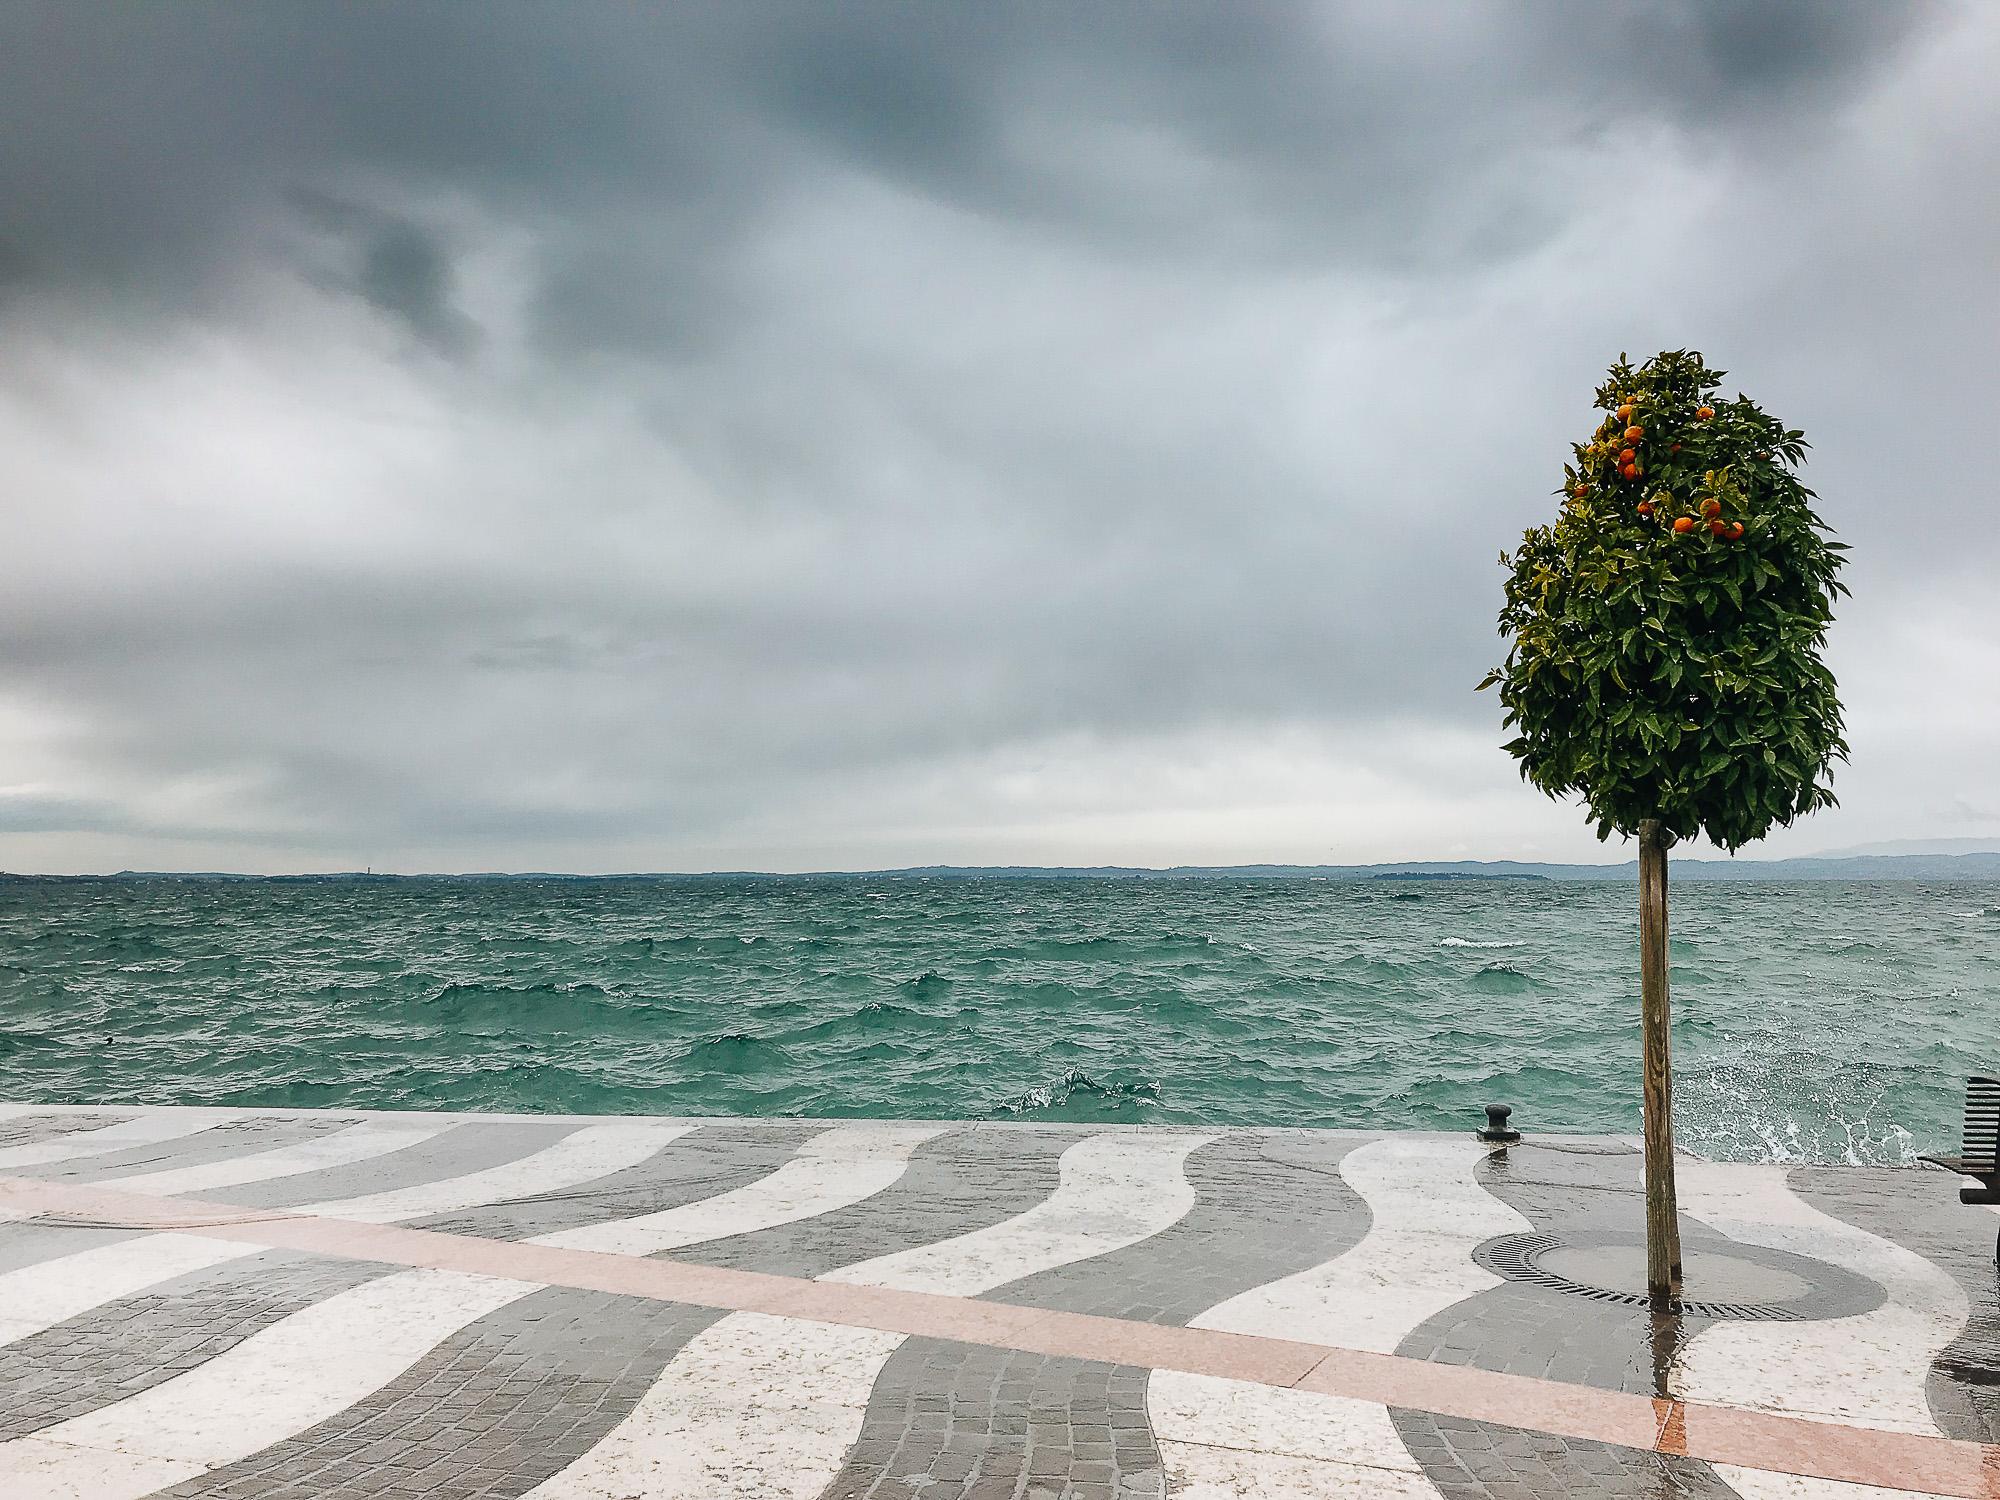 OurBeautifulAdventure-LakeGarda-Italy-Blog-6418.jpg